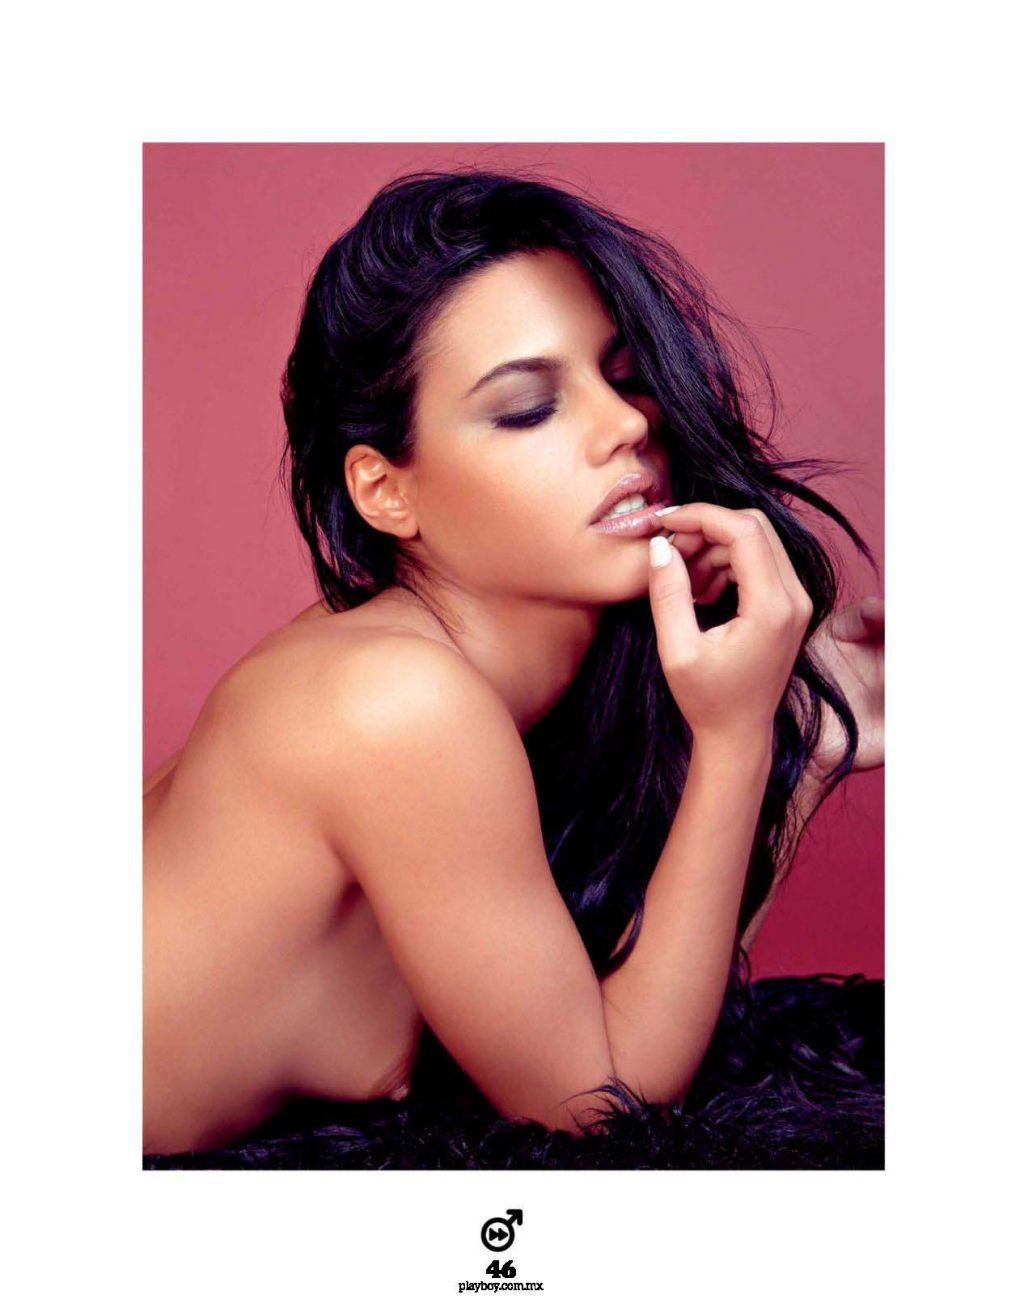 Georgia anderson photo nude naked